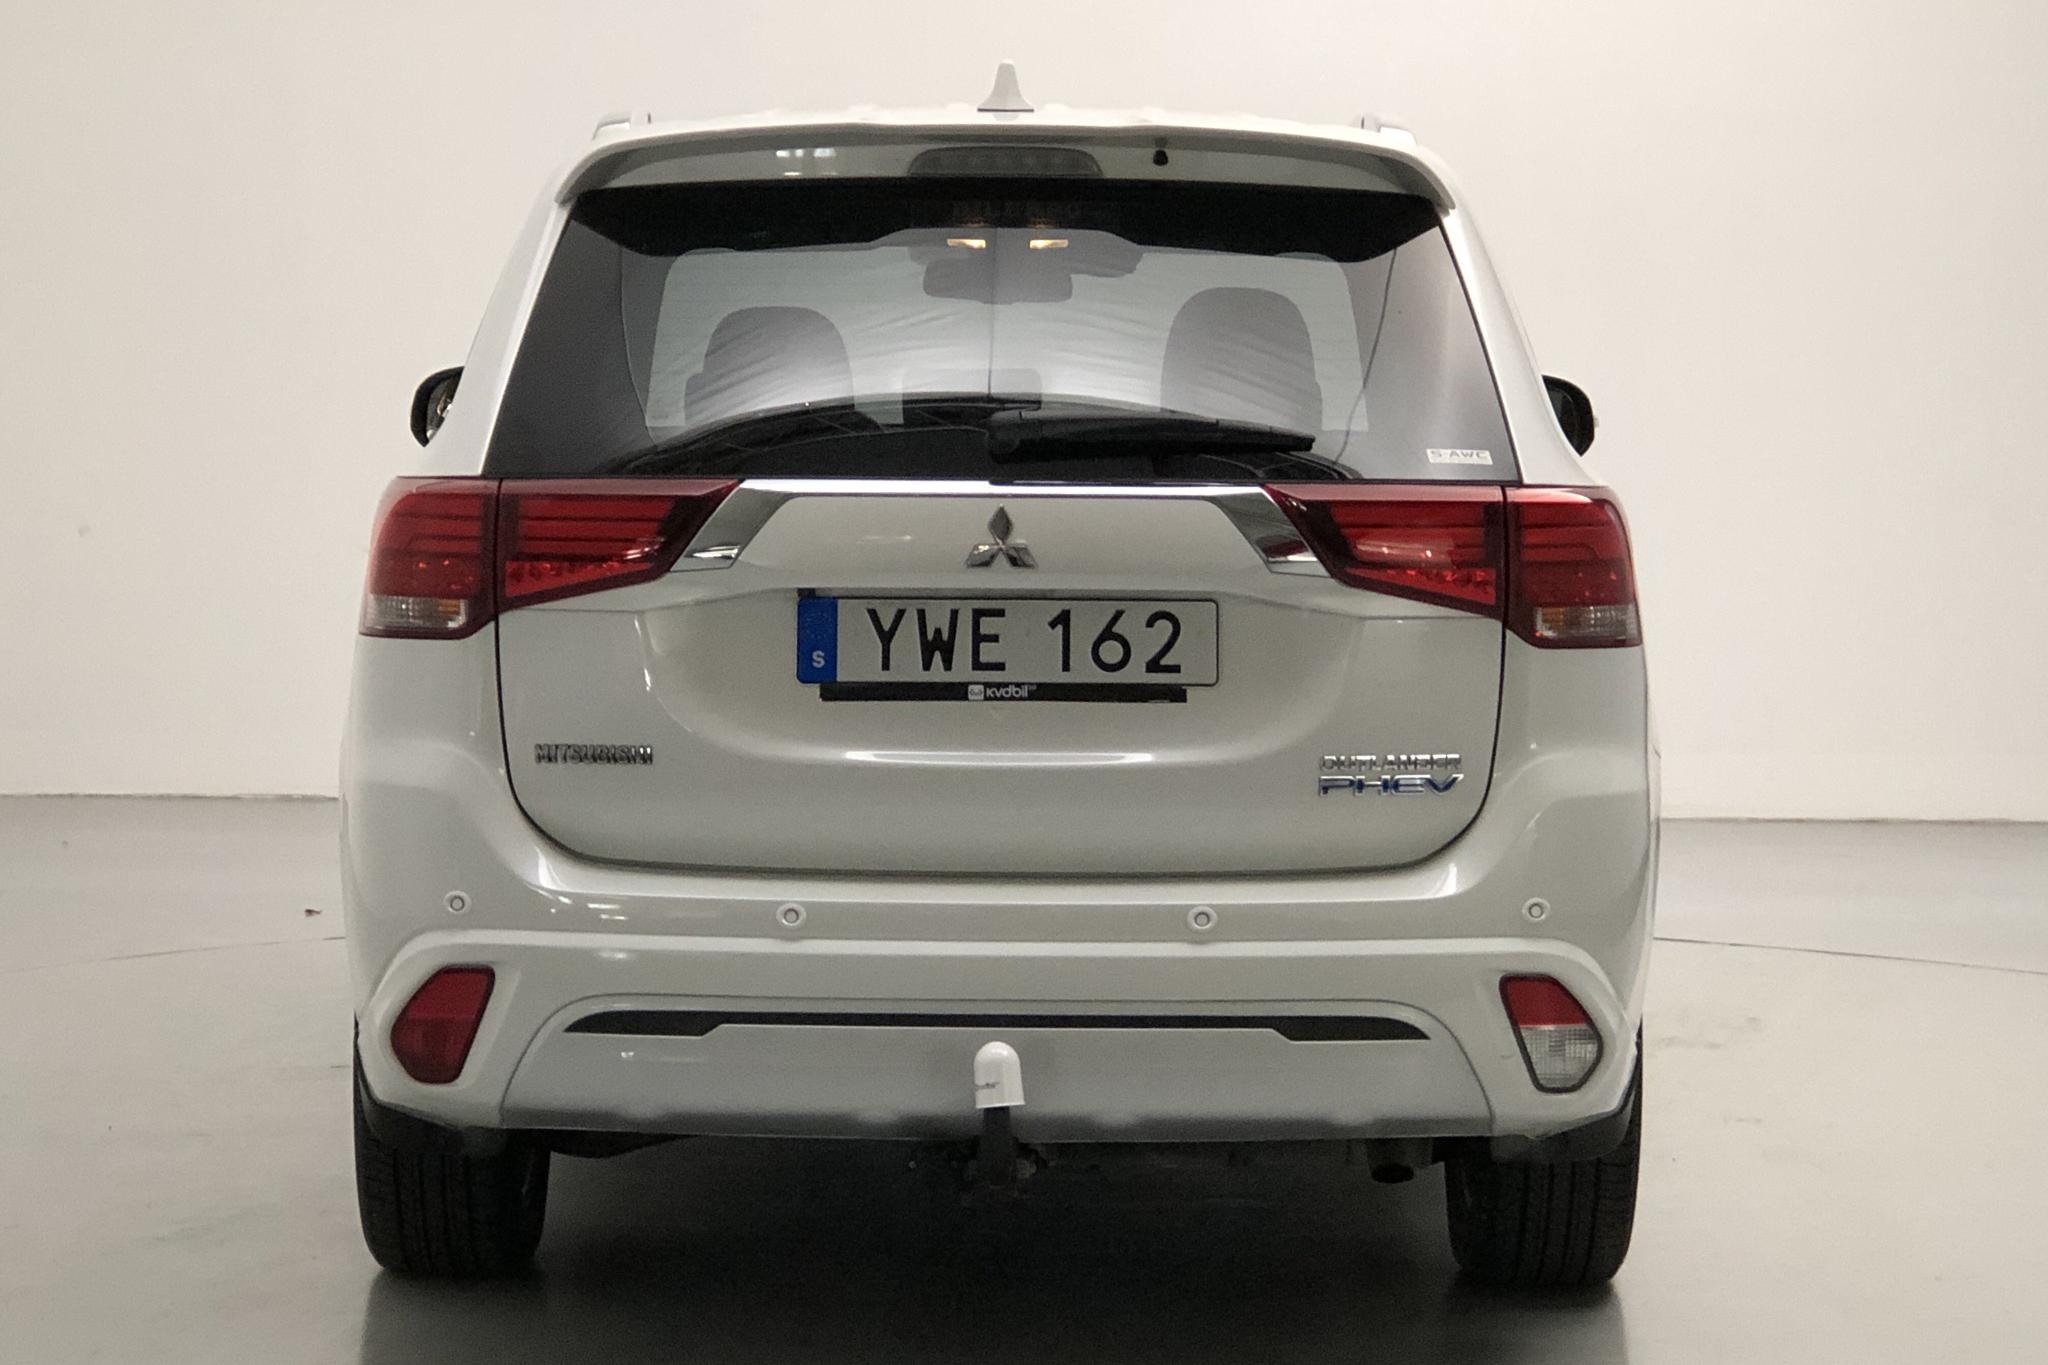 Mitsubishi Outlander 2.4 Plug-in Hybrid 4WD (136hk) - 49 760 km - Automatic - white - 2019